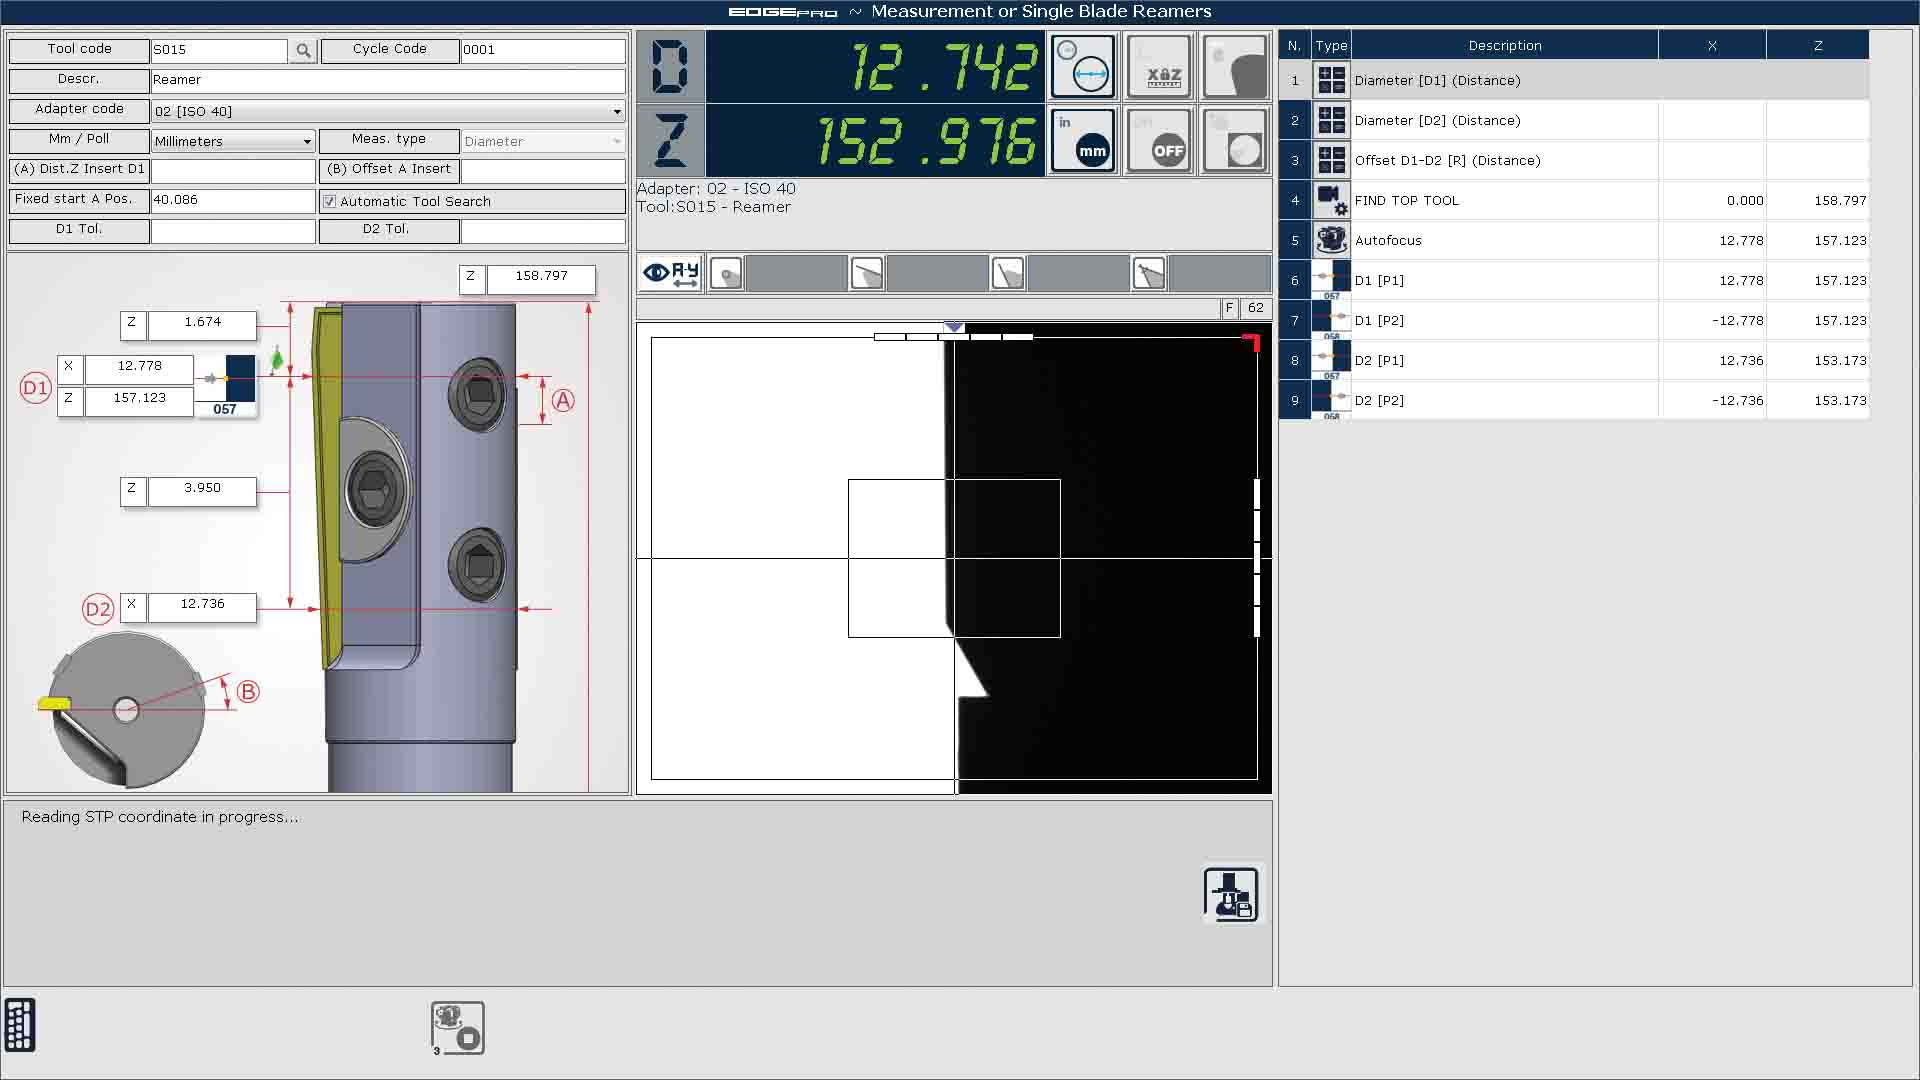 Edge Pro Reamers screen capture.